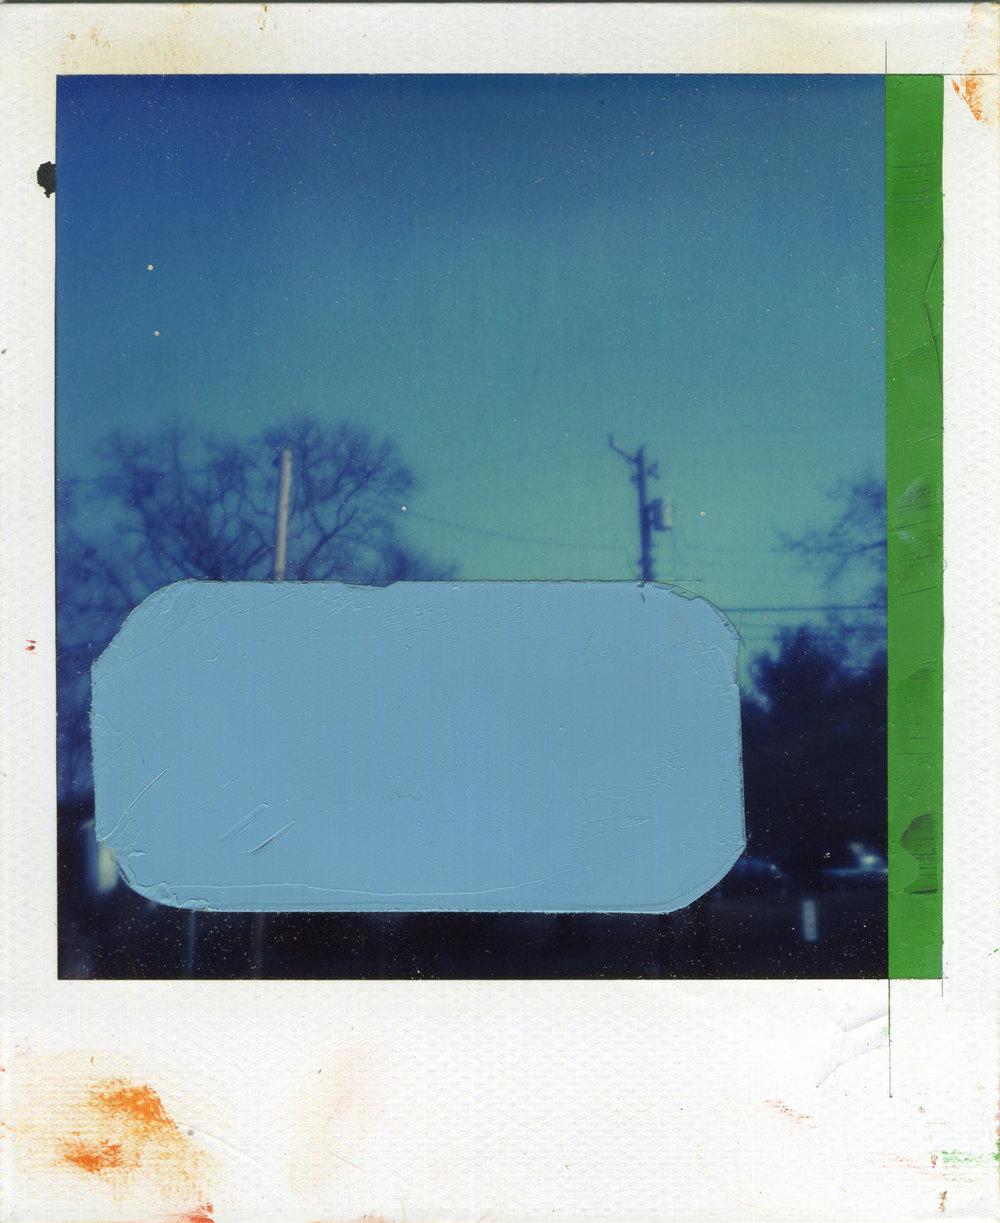 "INTERSECTION (CENSOR)   oil on sx-70 Polaroid | 3.25"" x 4.25"" | 2013"